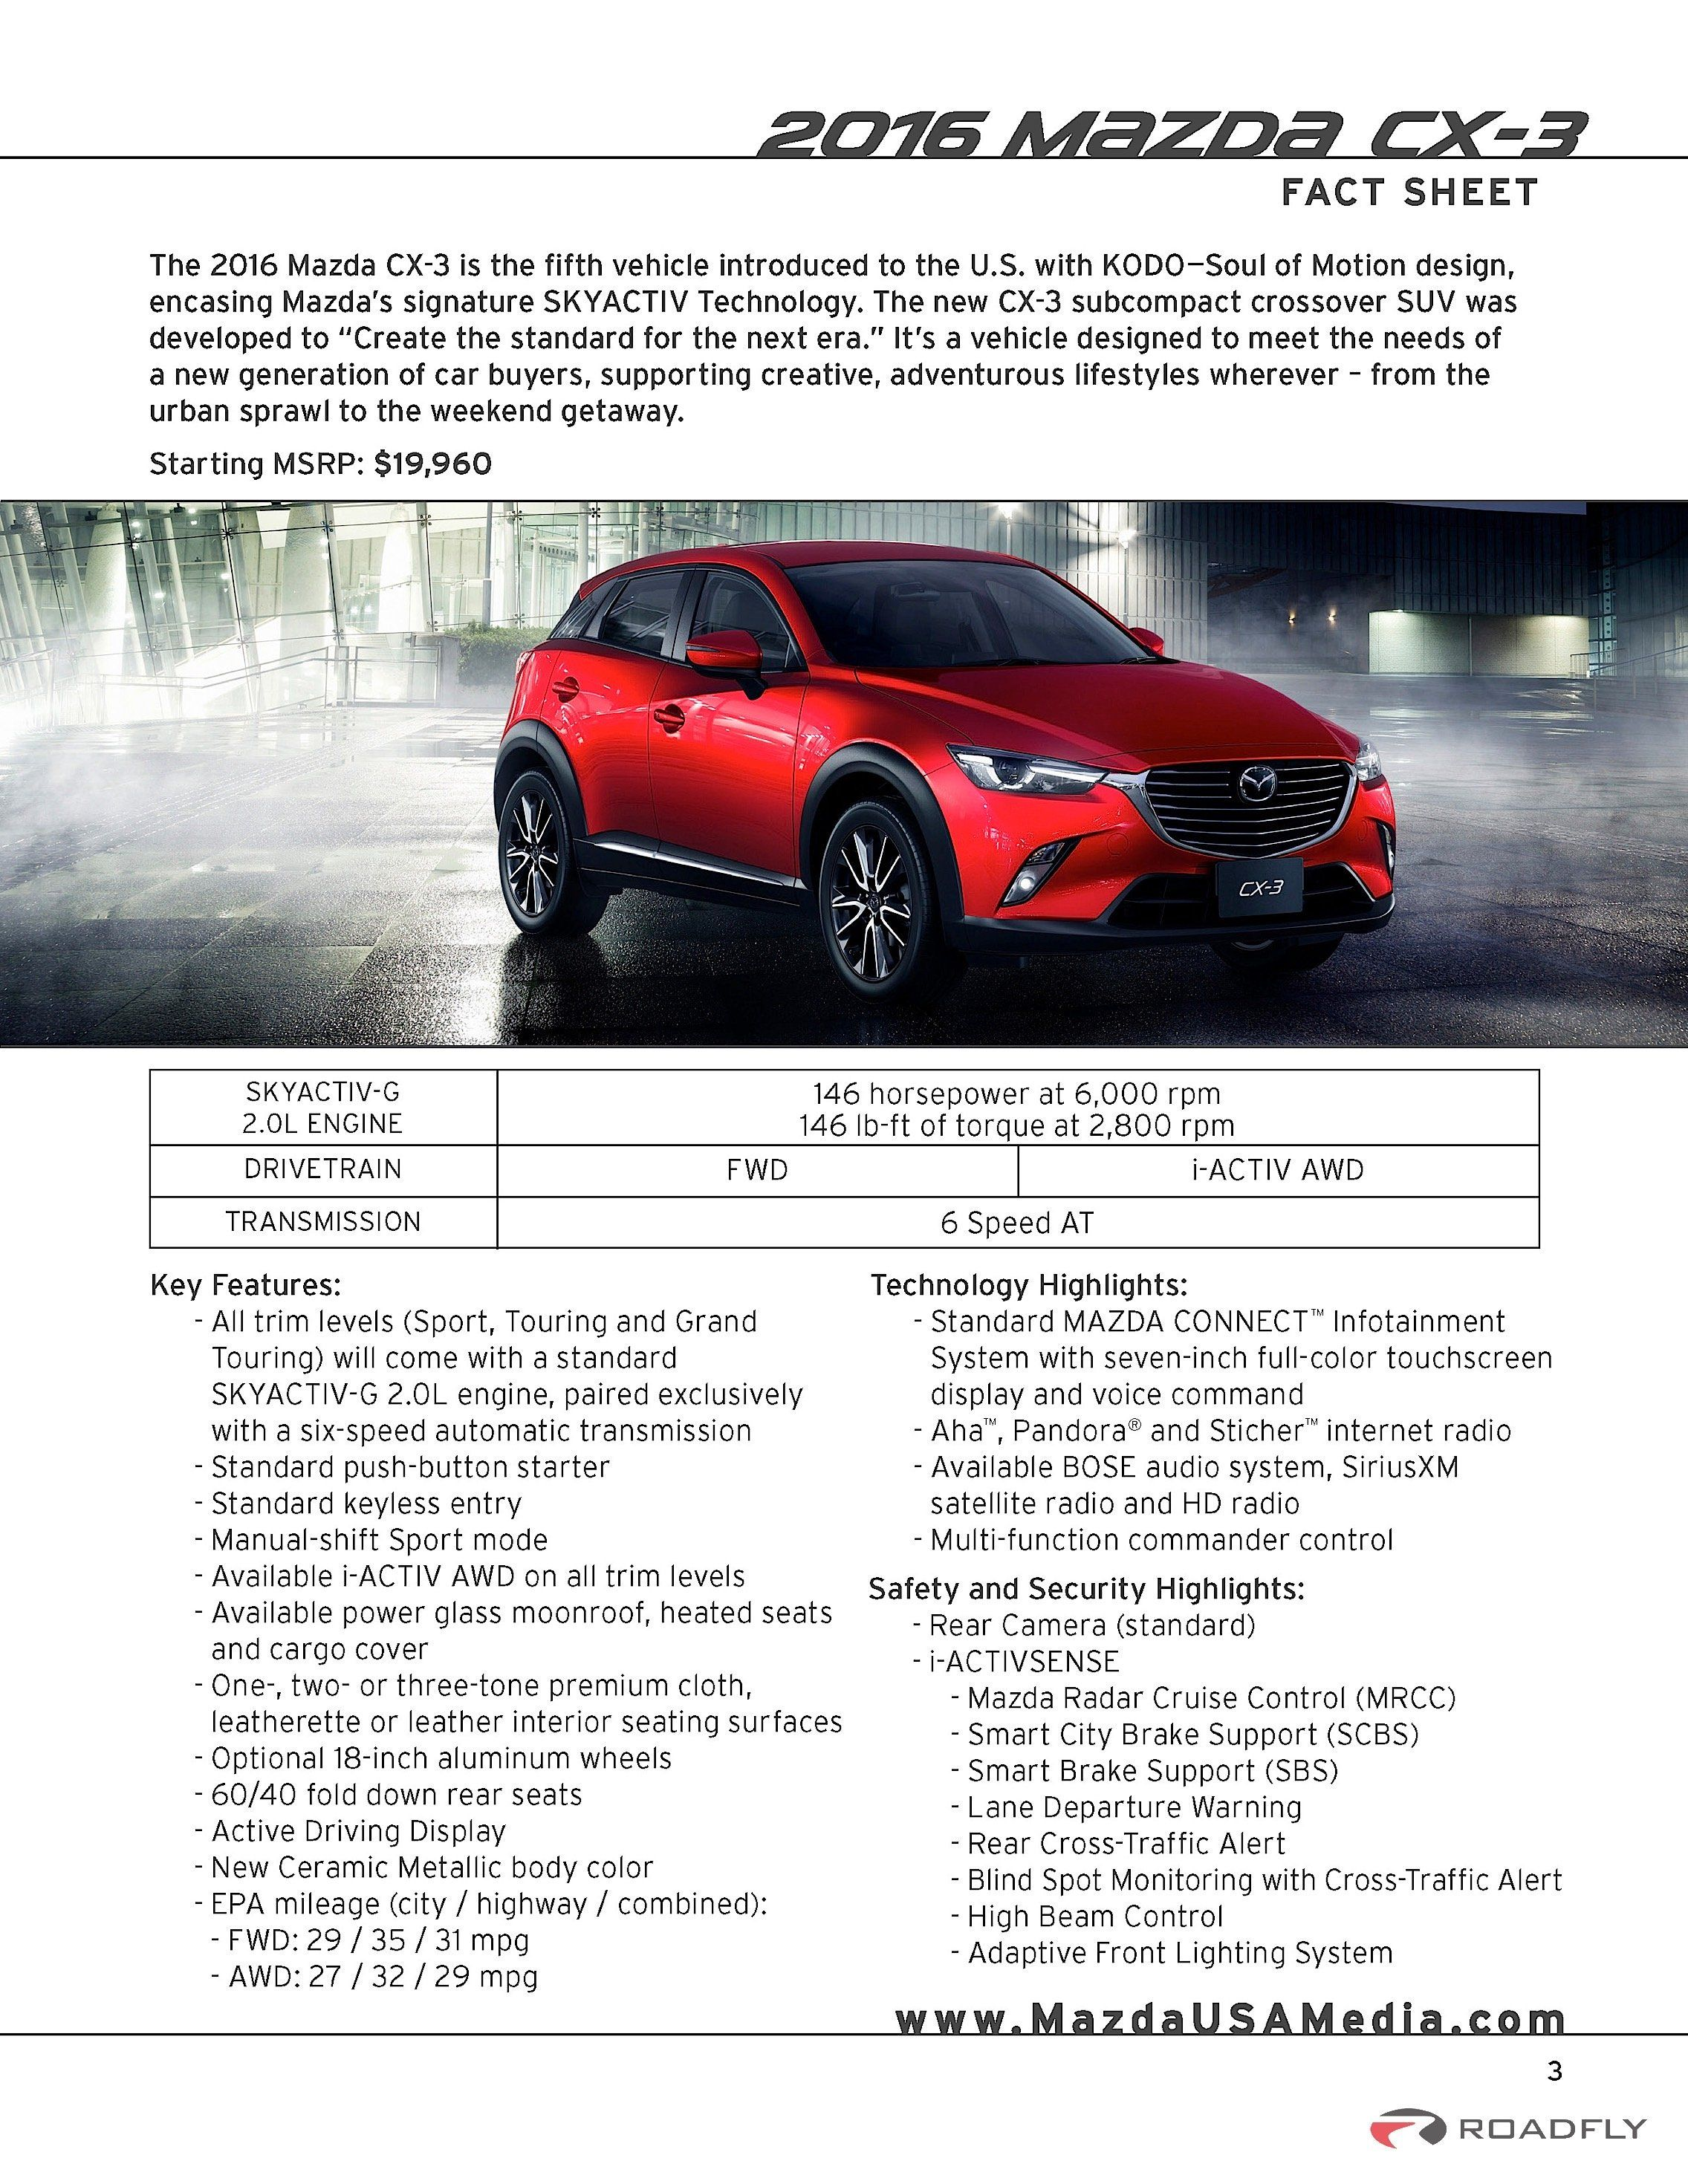 2016 mazda cx 3 specs overview presentation roadfly com car reviews presentationwebsiteroadsmazdahtmlcar